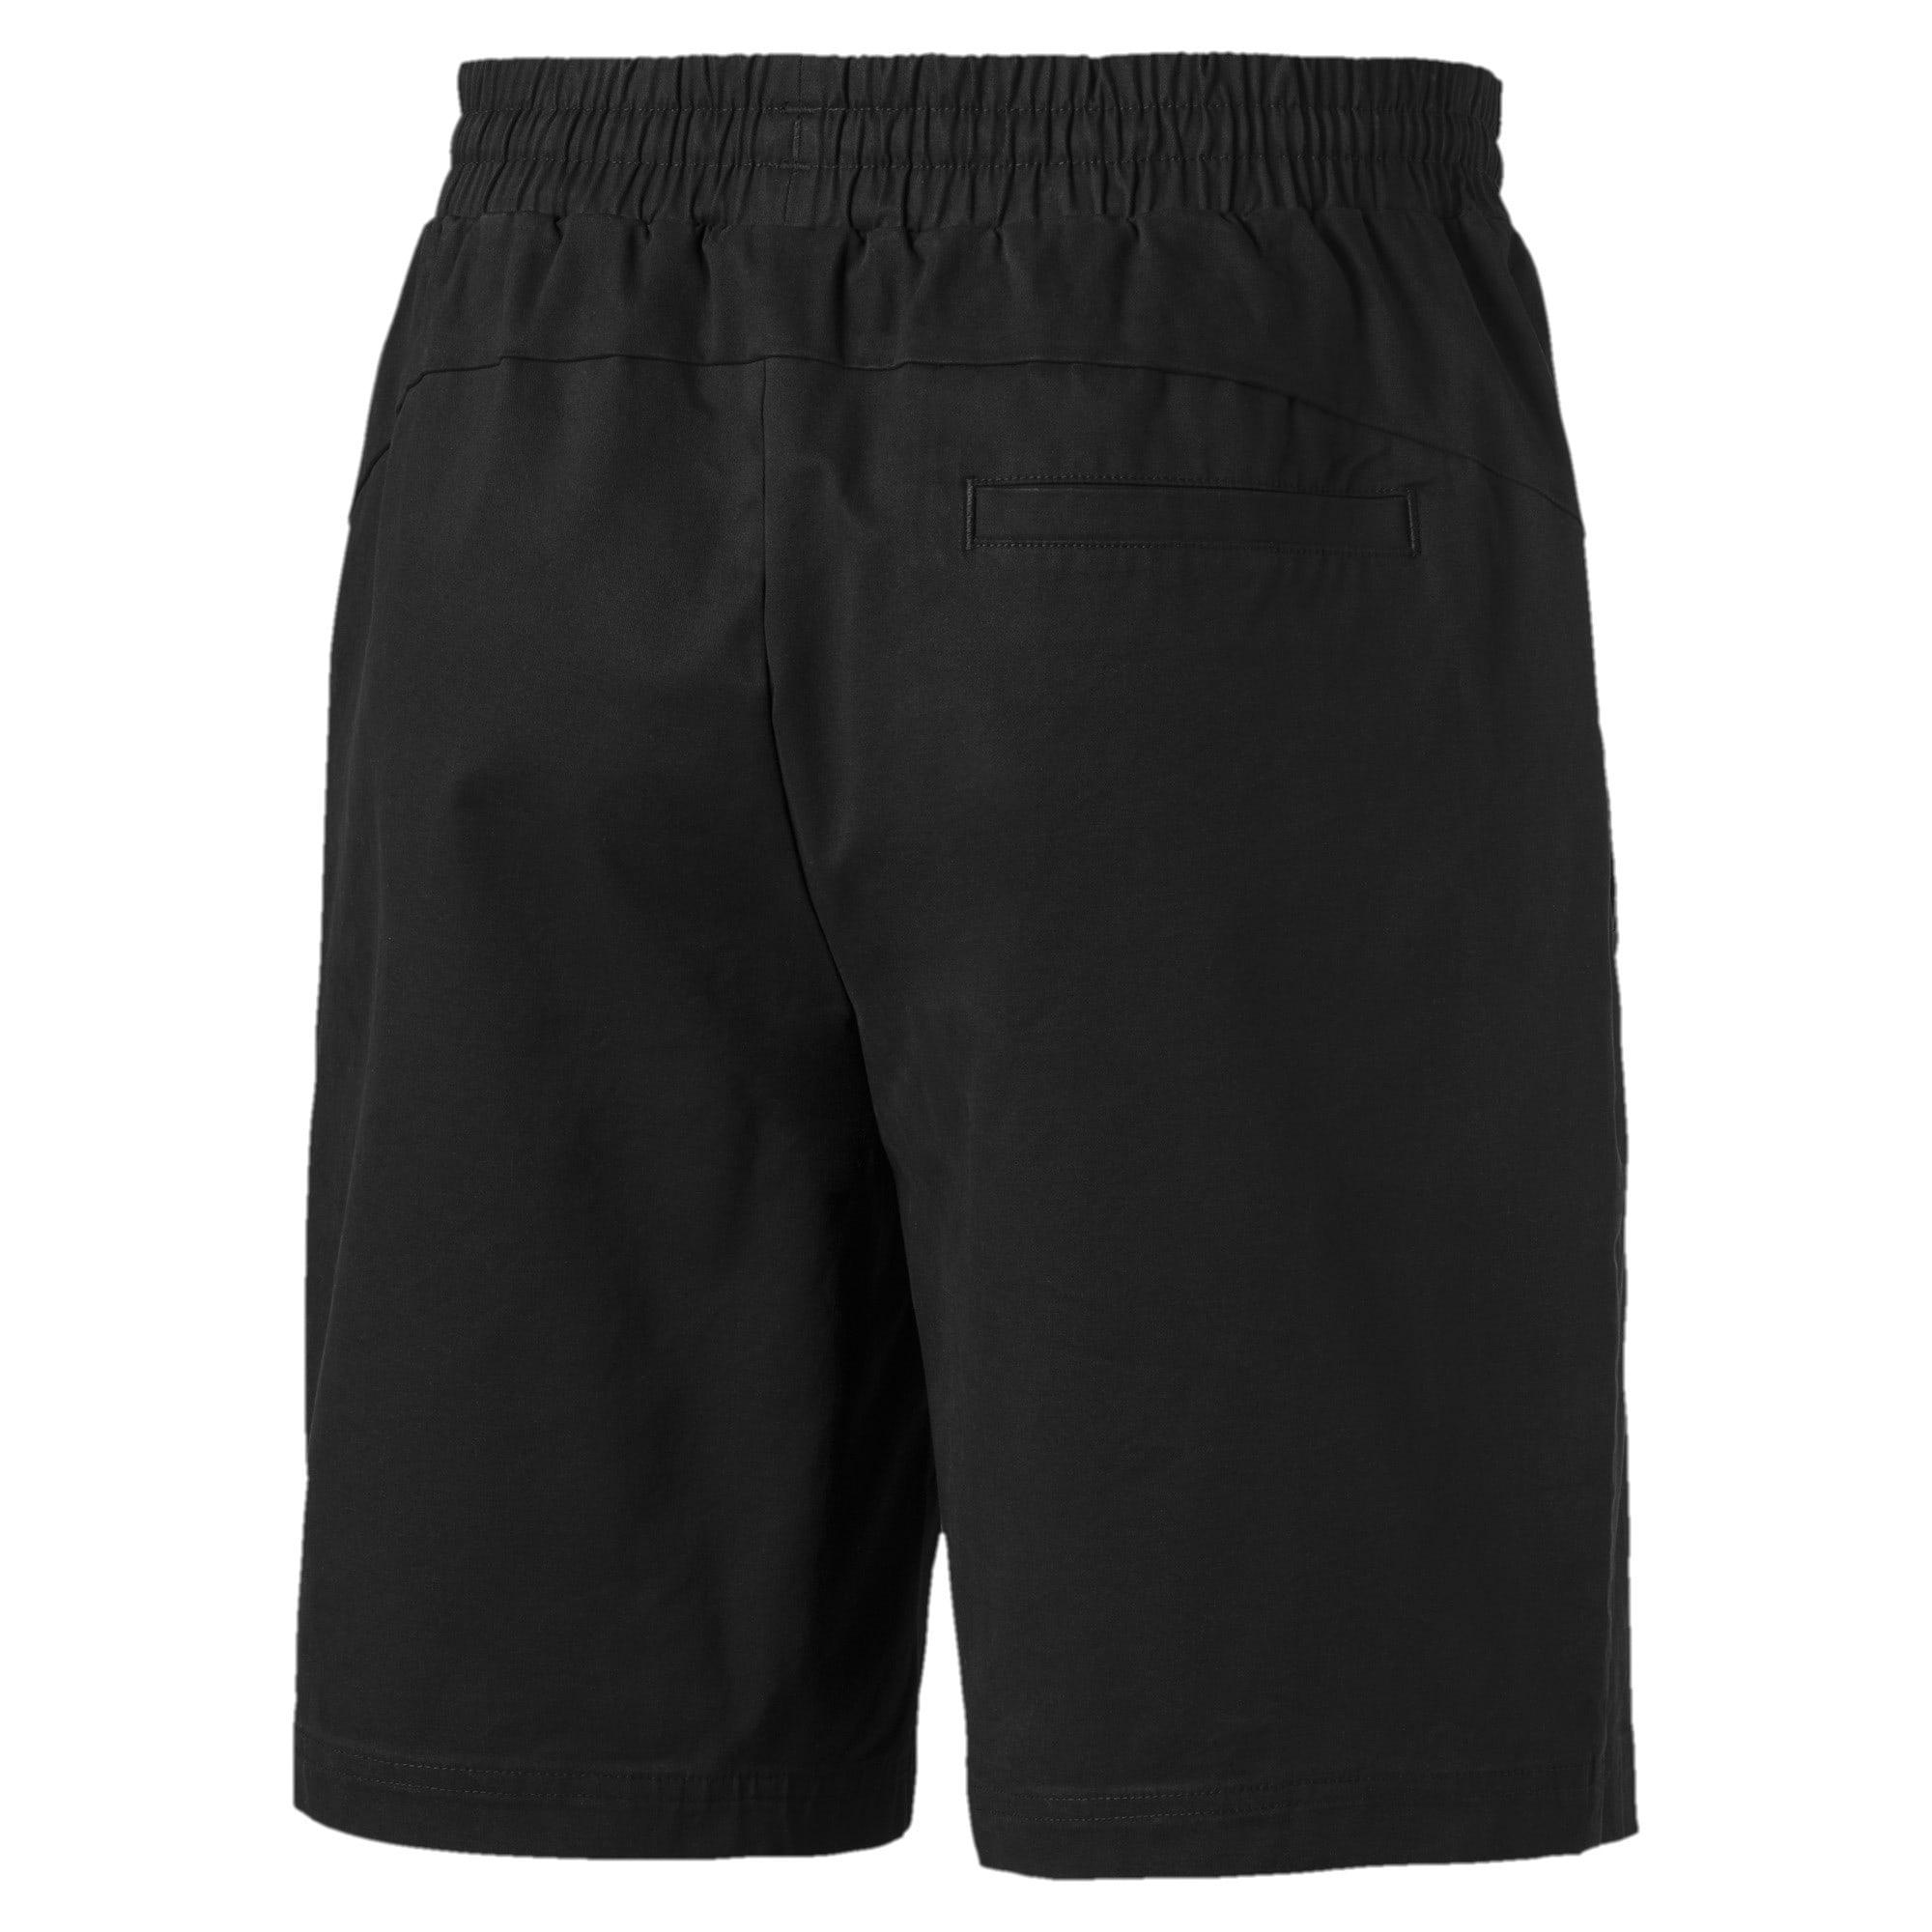 Thumbnail 5 of Fusion Men's Shorts, Puma Black, medium